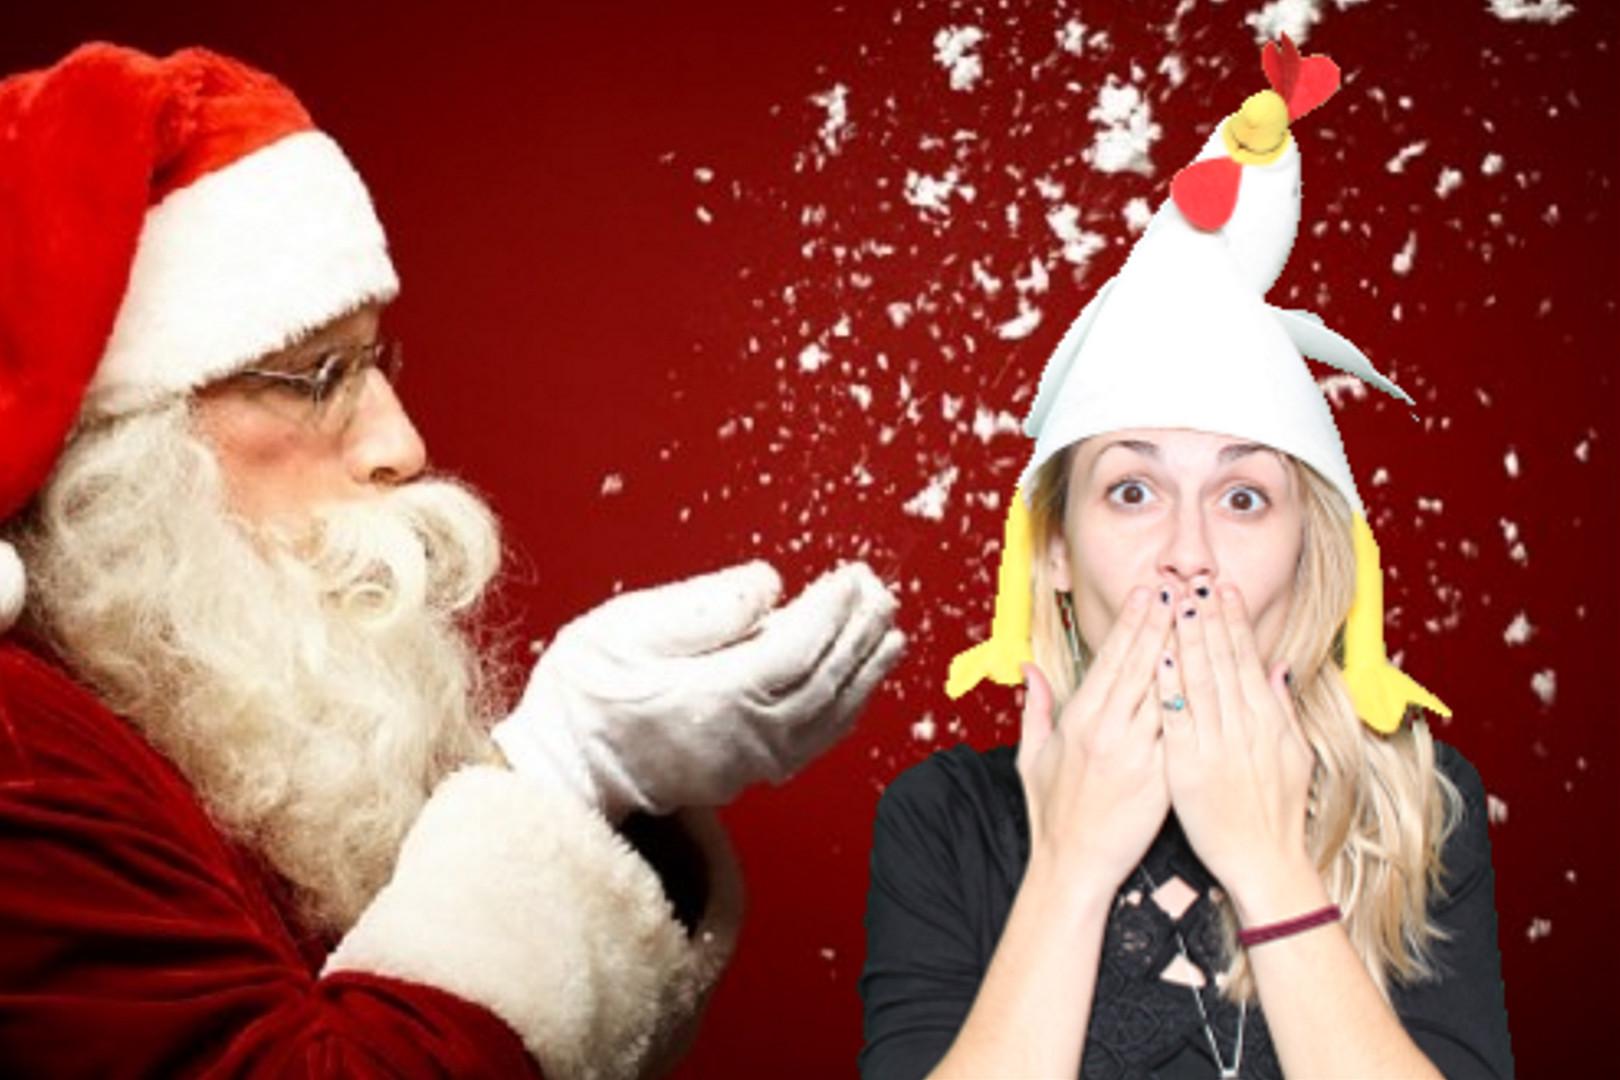 Santa_Snow_GreenScreen.jpg